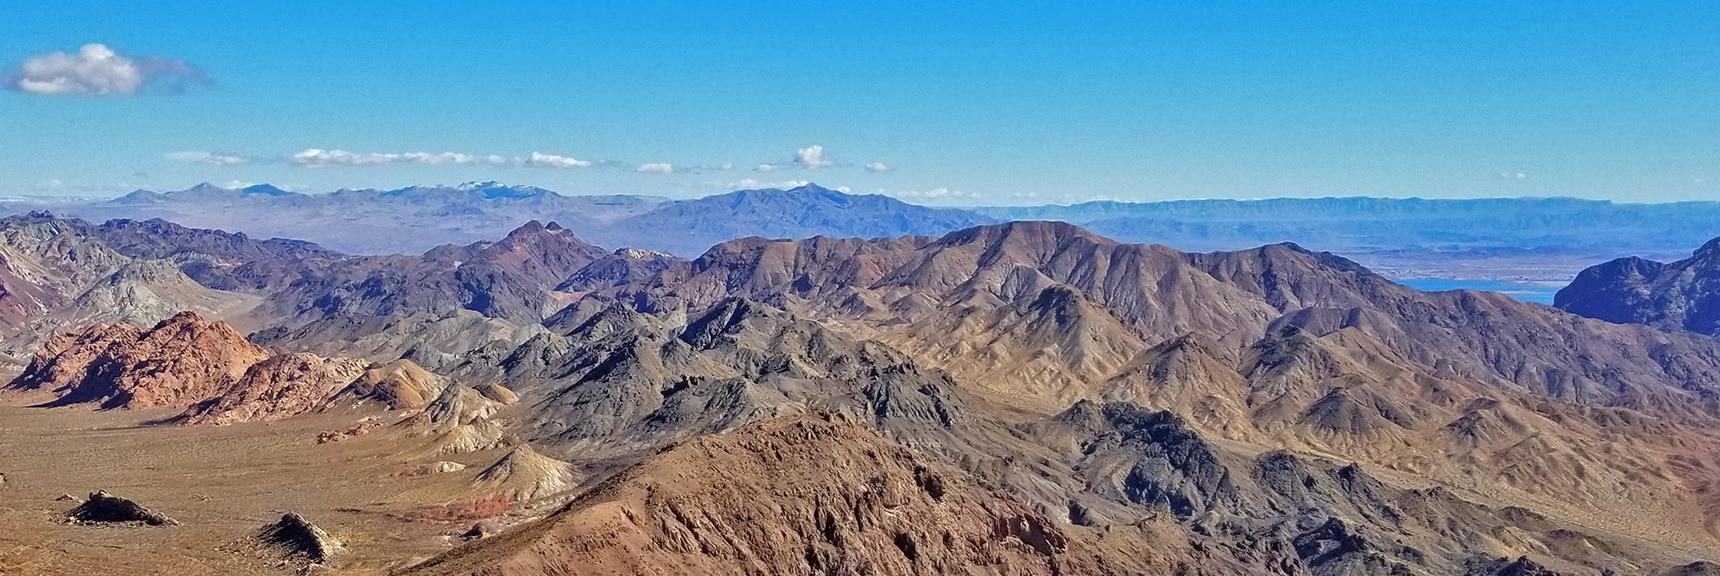 Virgin Mts?, Jimbilnan Wilderness? in Far Background | Hamblin Mountain, Lake Mead National Conservation Area, Nevada